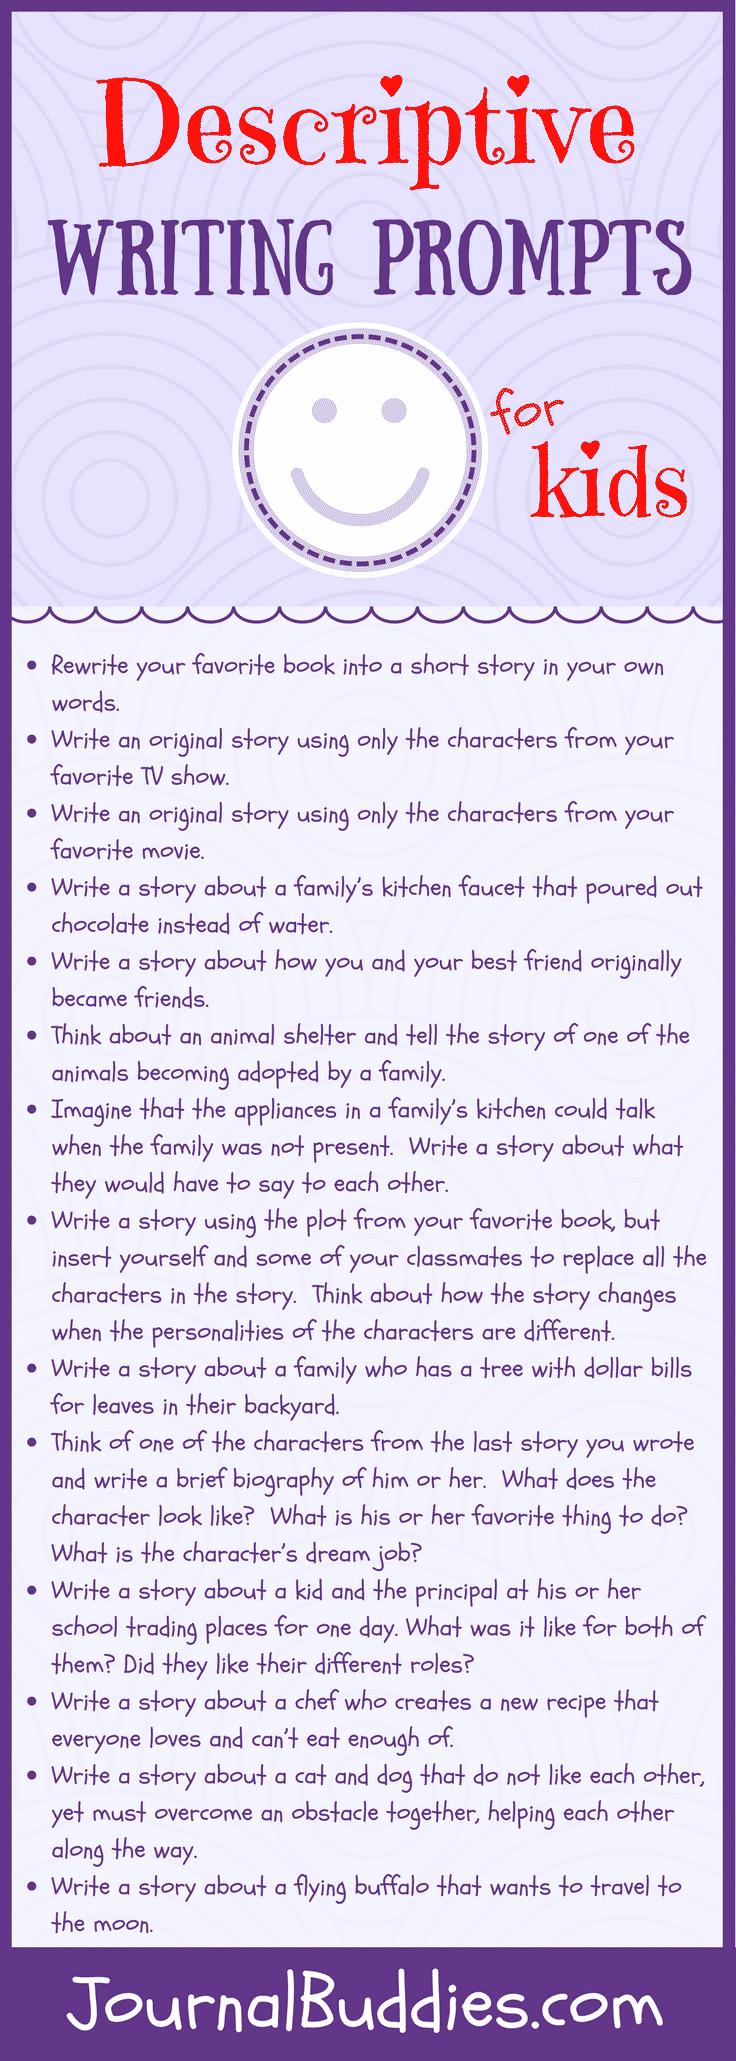 Argumentative essay about the scarlet letter